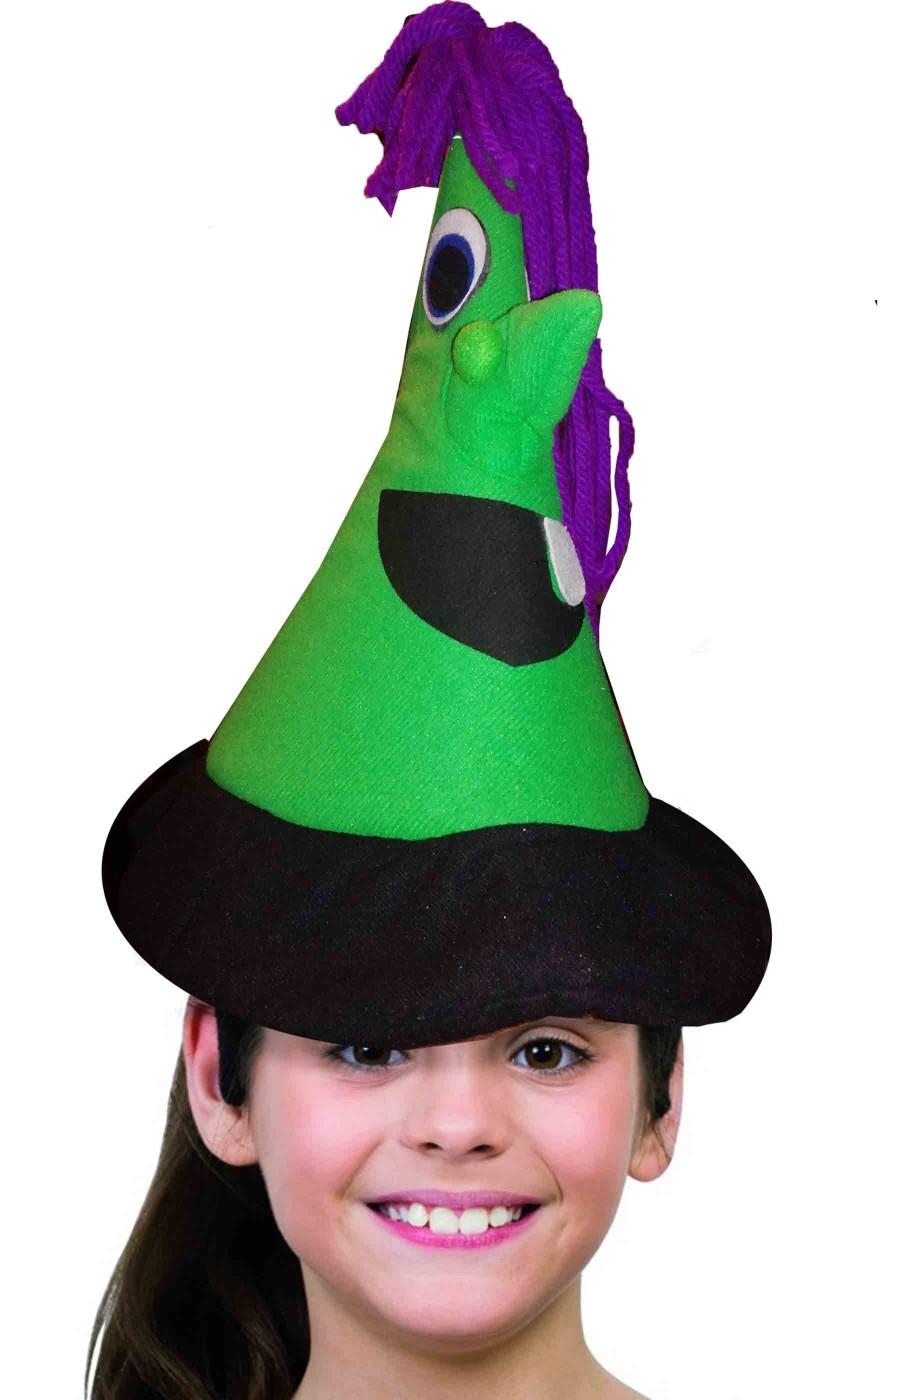 Cappello da strega o befana verde con occhi e nasone